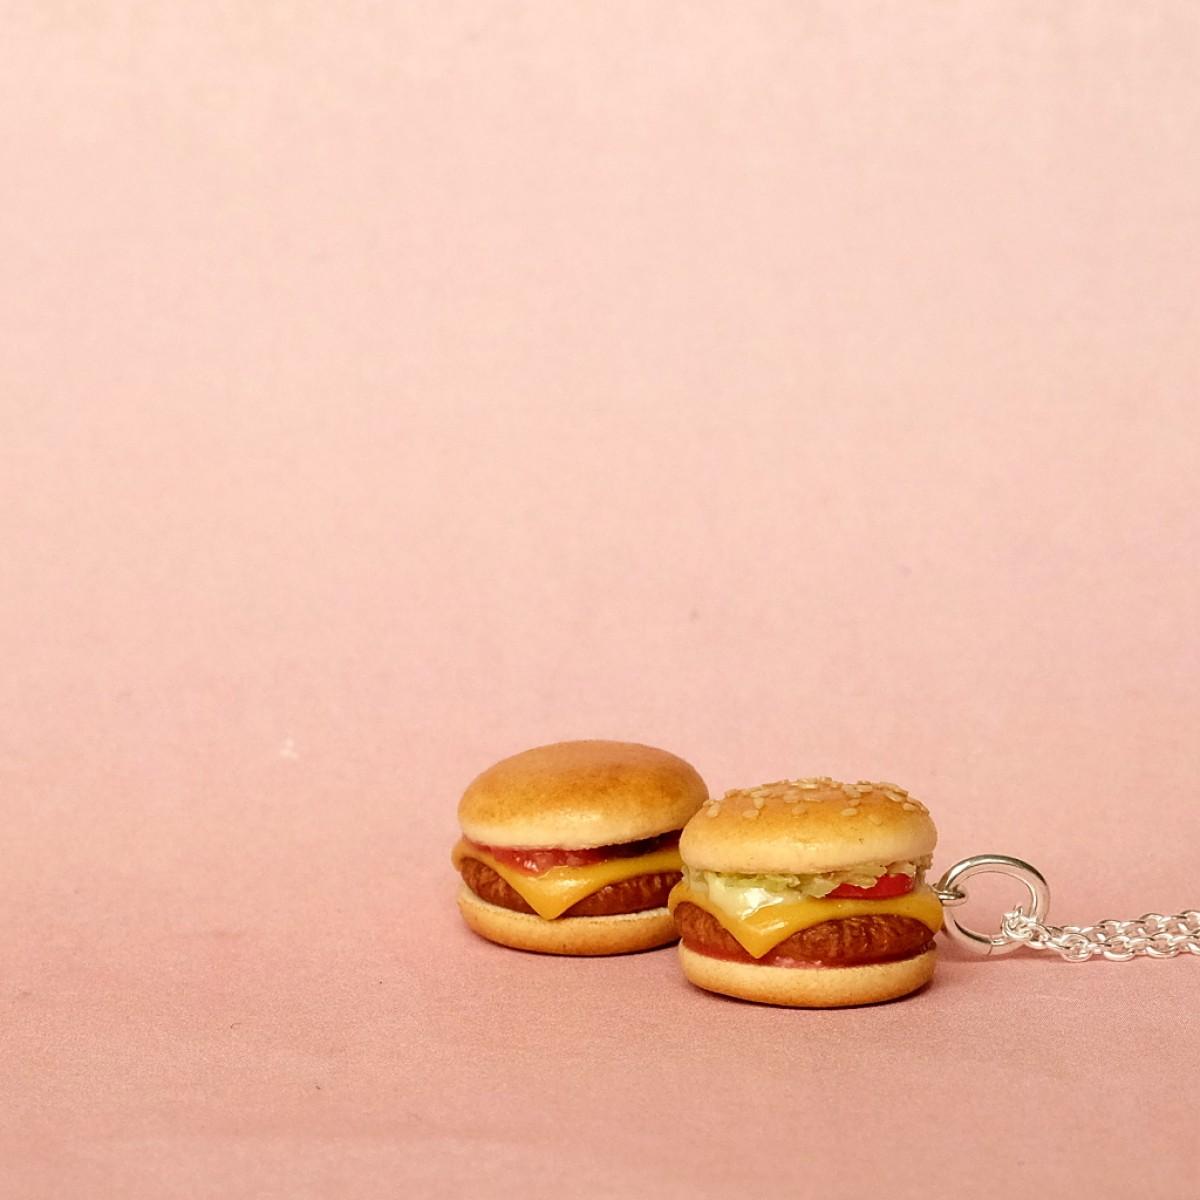 minischmidt miniTONI's Fastfood - Cheesburger & Hamburger Anhänger